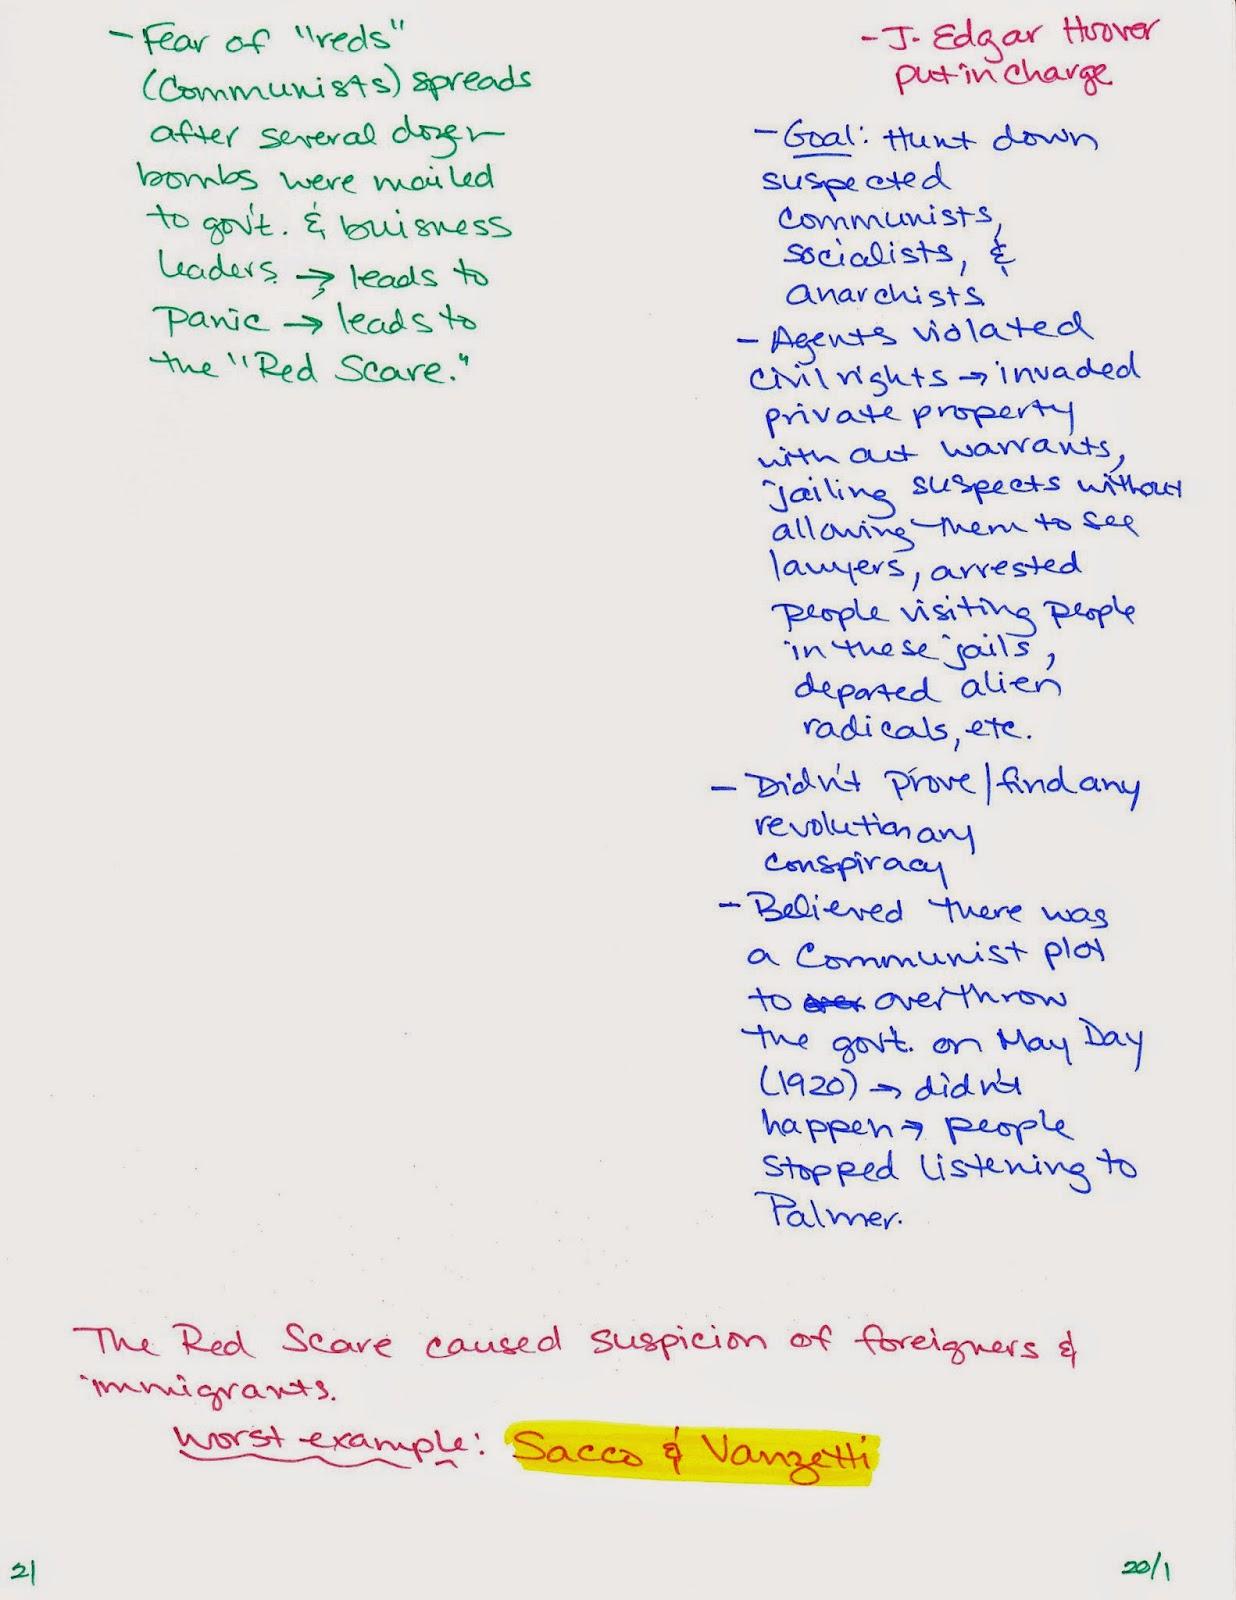 us history chapter 21 notes Study notes, llc, 17 nov 2012 web 06 sep 2018.